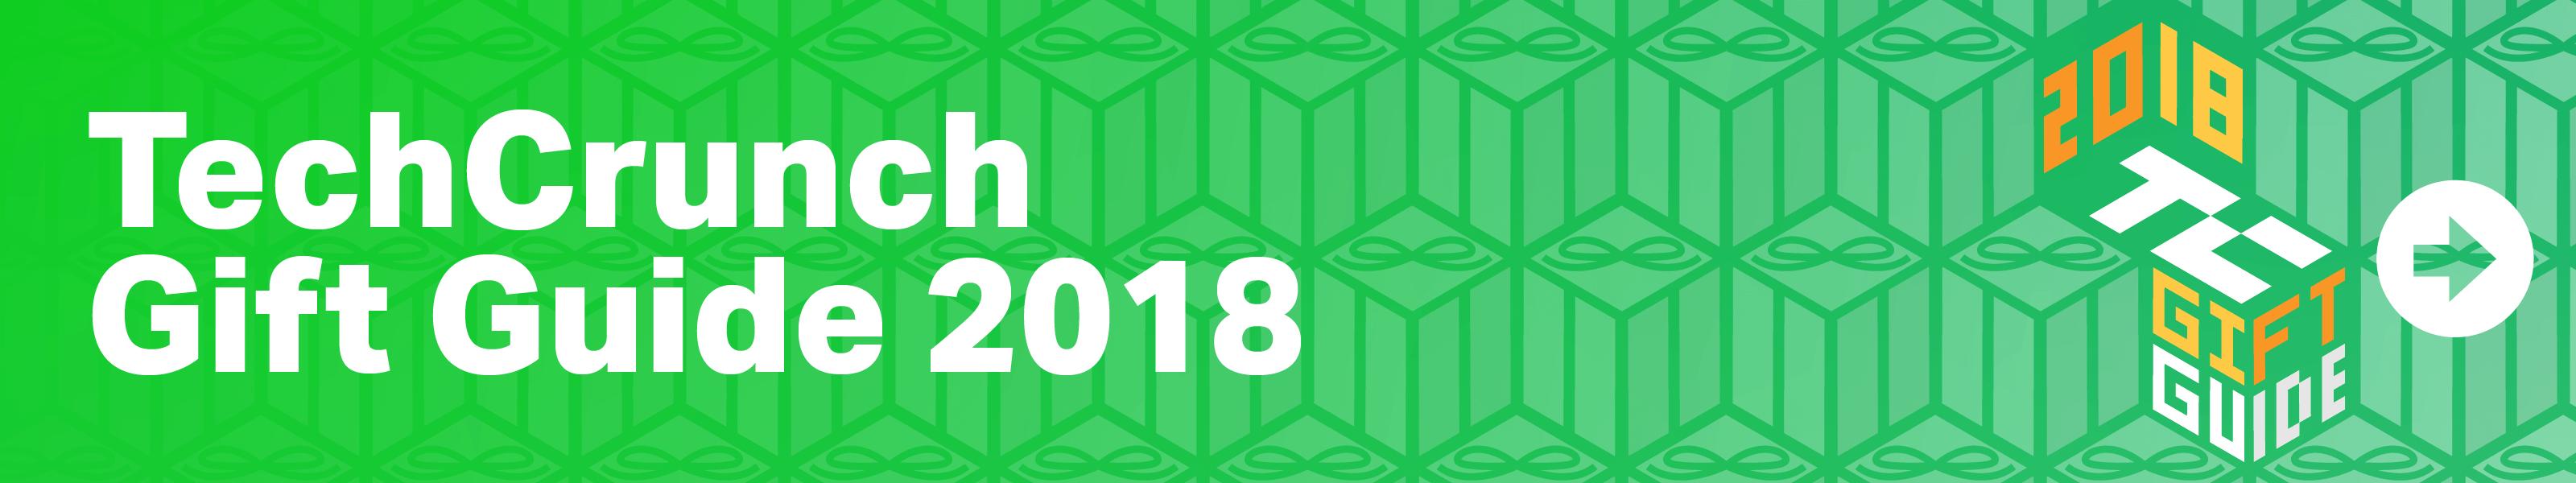 TechCrunch Gift Guide 2018 banner